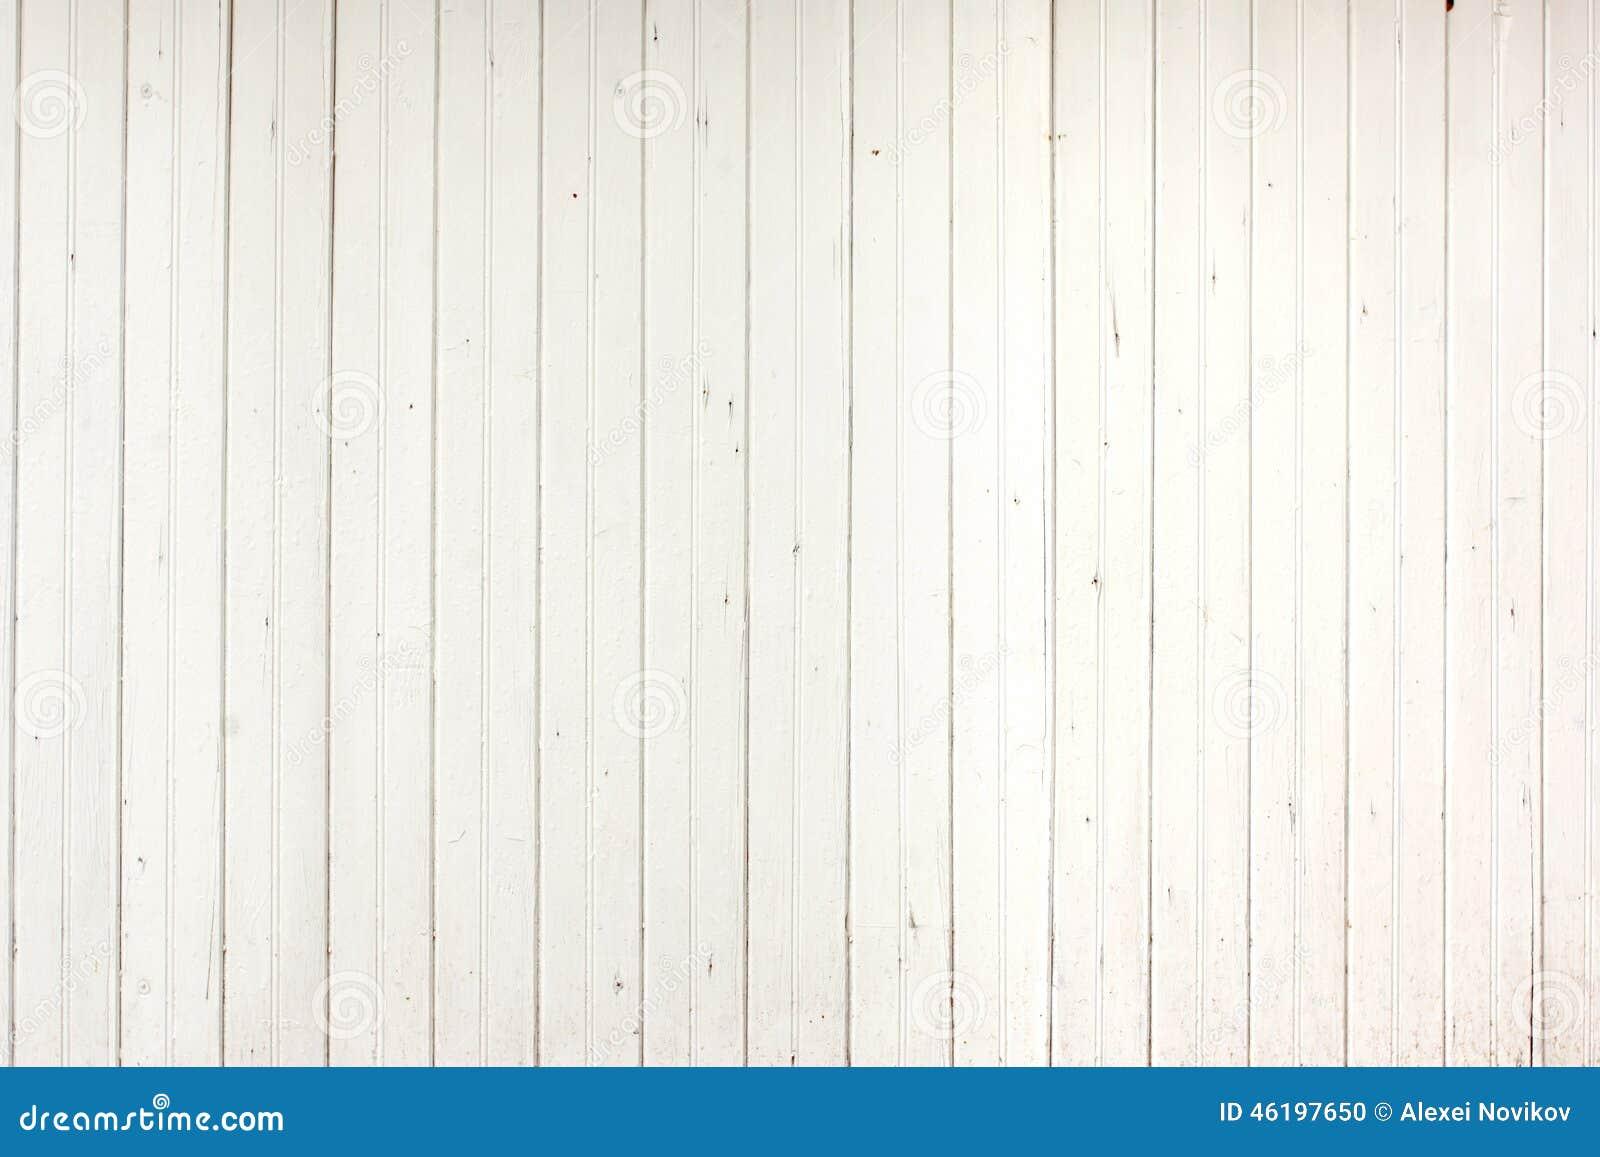 White Wood Planks Panel - White Wood Planks Panel Stock Photo - Image: 46197650